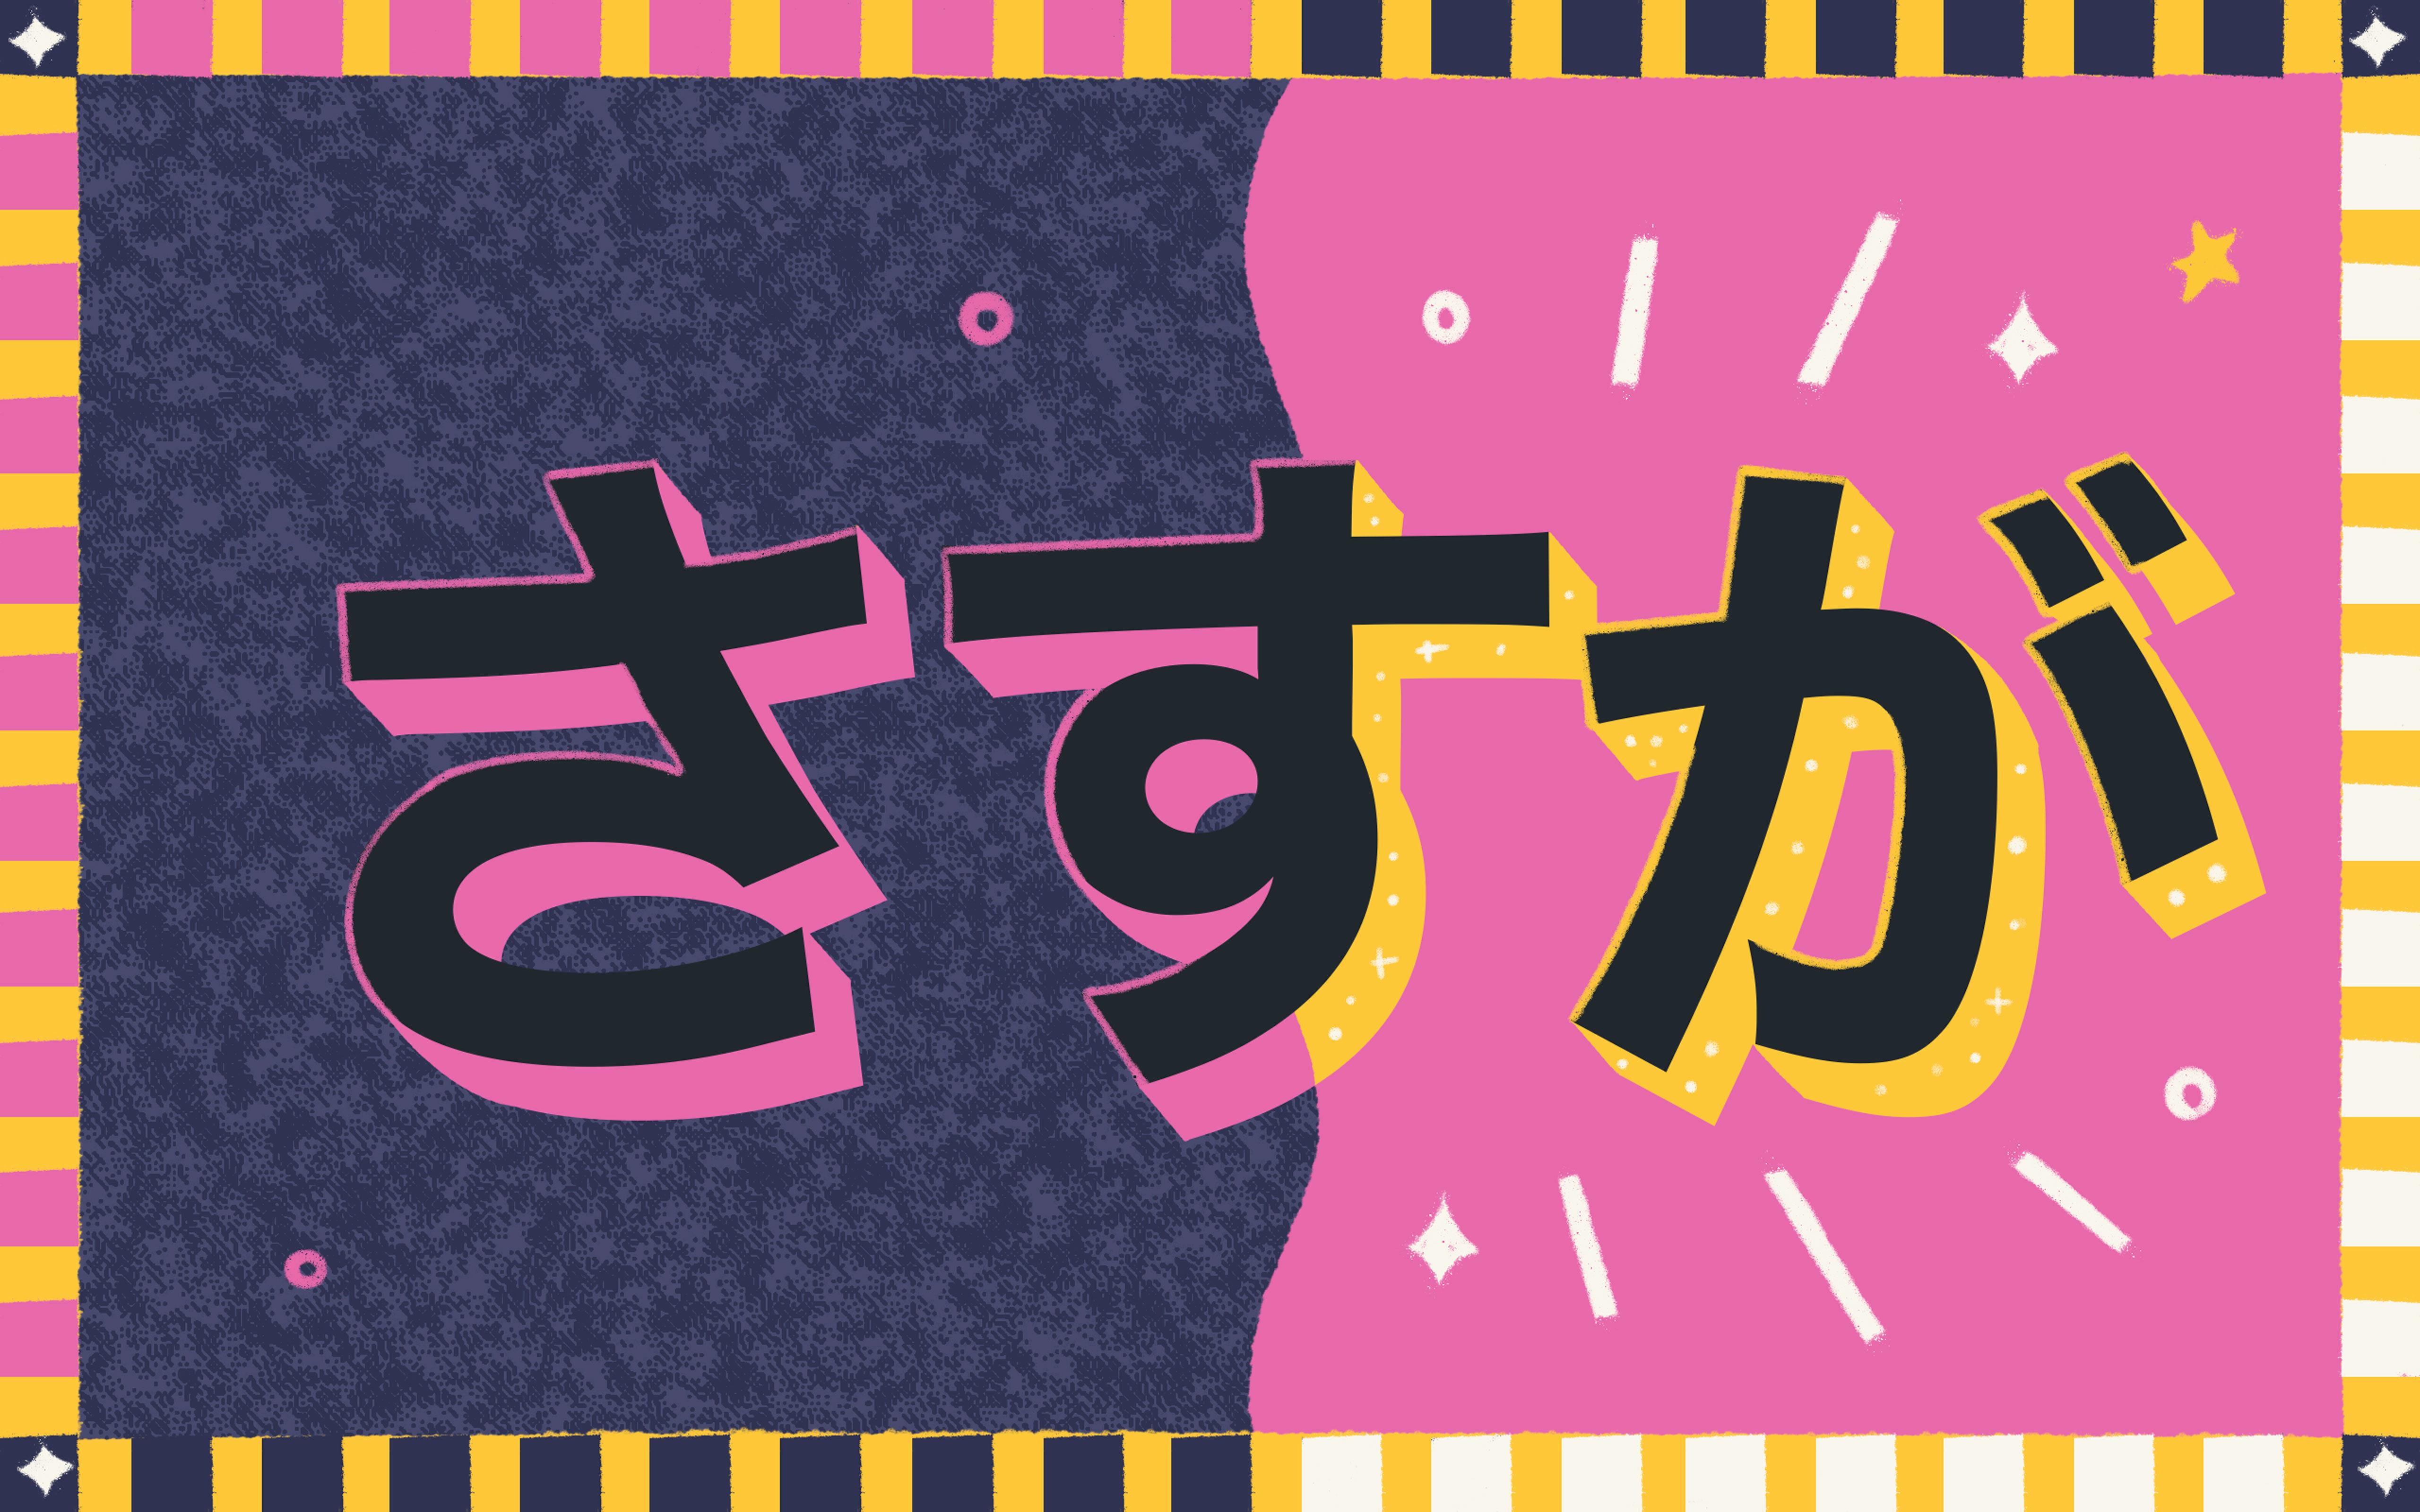 Á•ã™ãŒ Sasuga Is Not Always A Compliment Sasuga maakt illustraties, infographics en animaties. tofugu